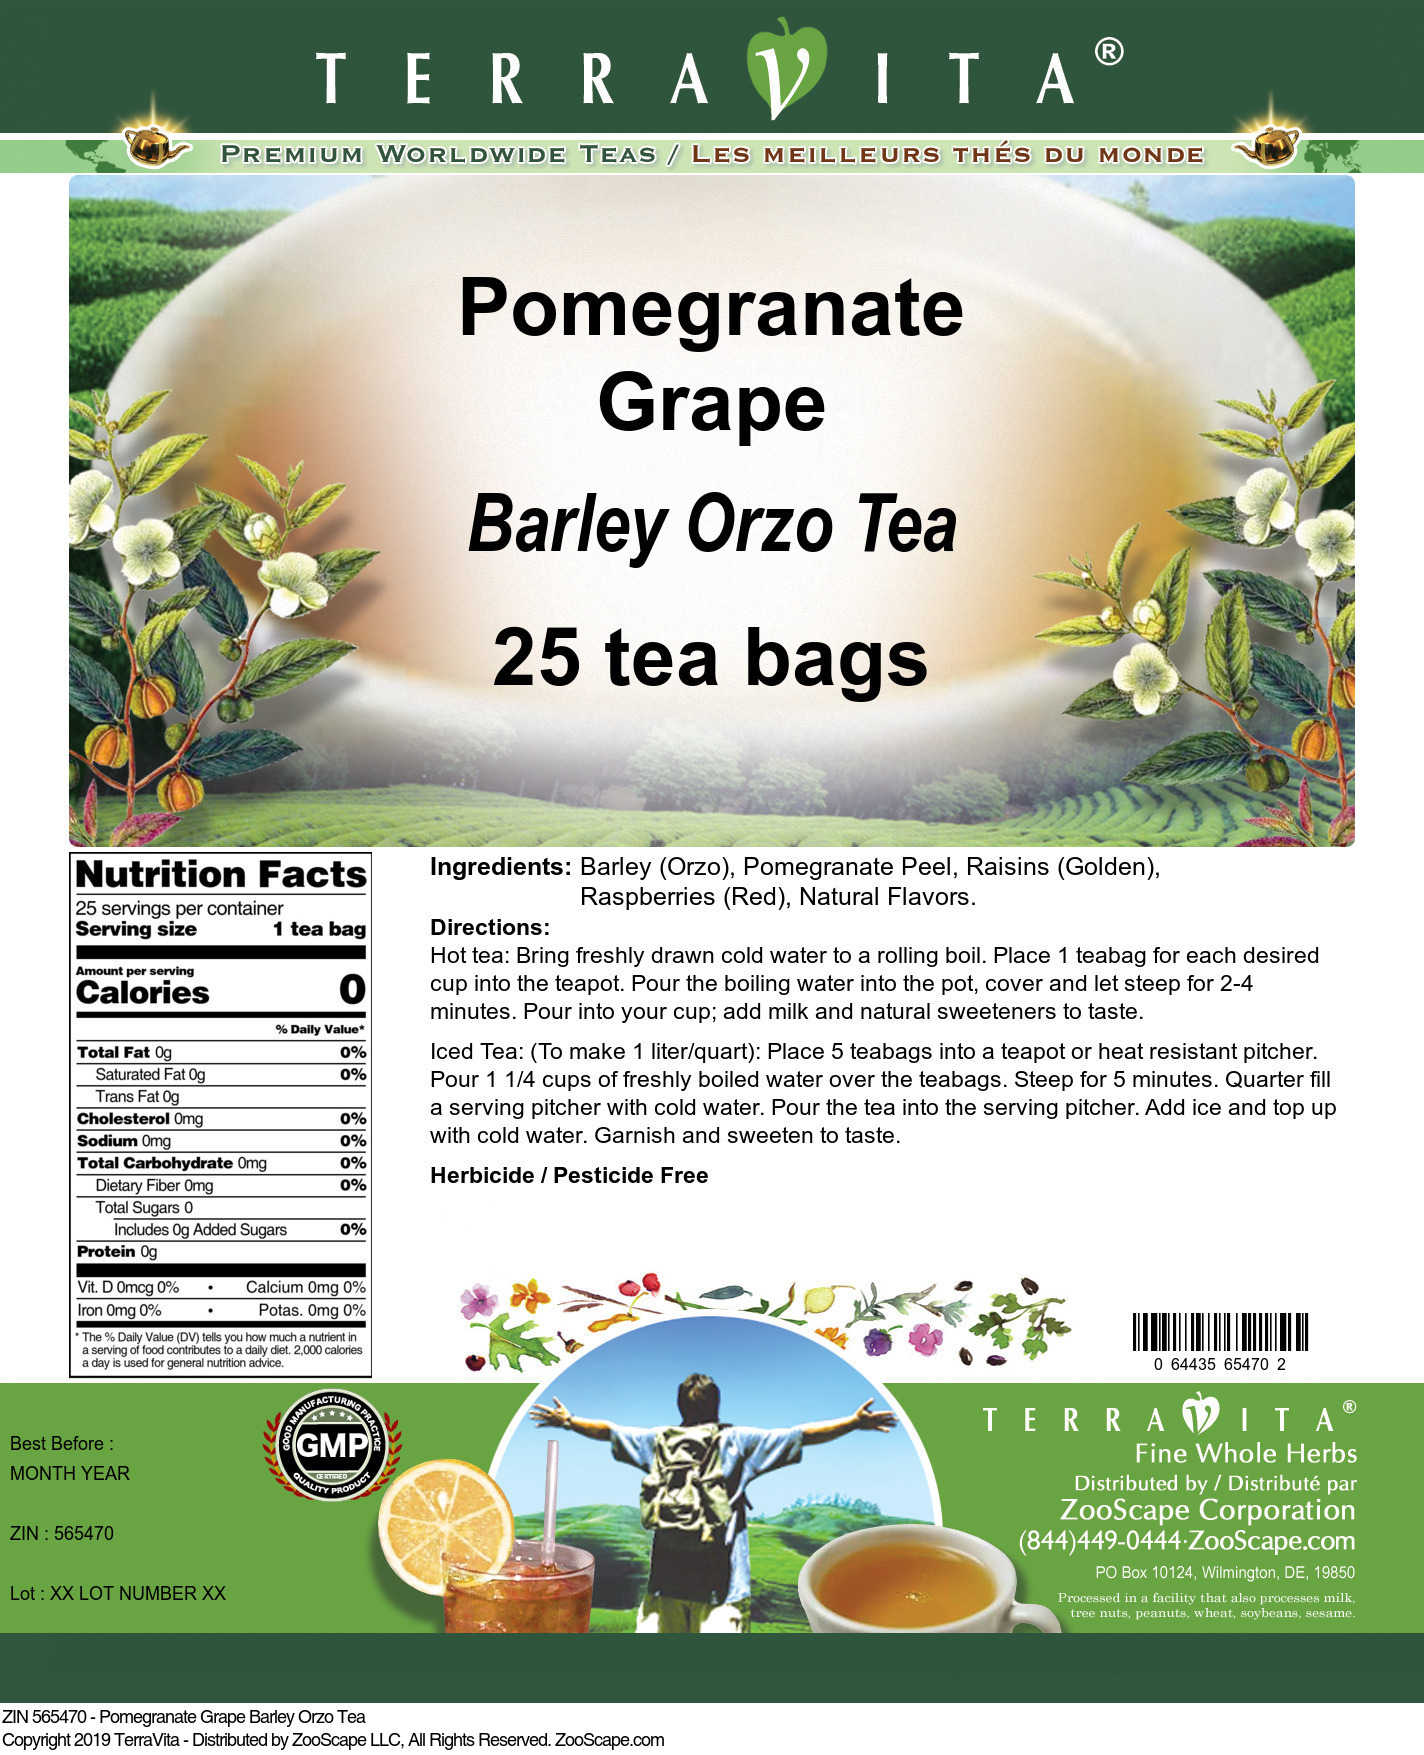 Pomegranate Grape Barley Orzo